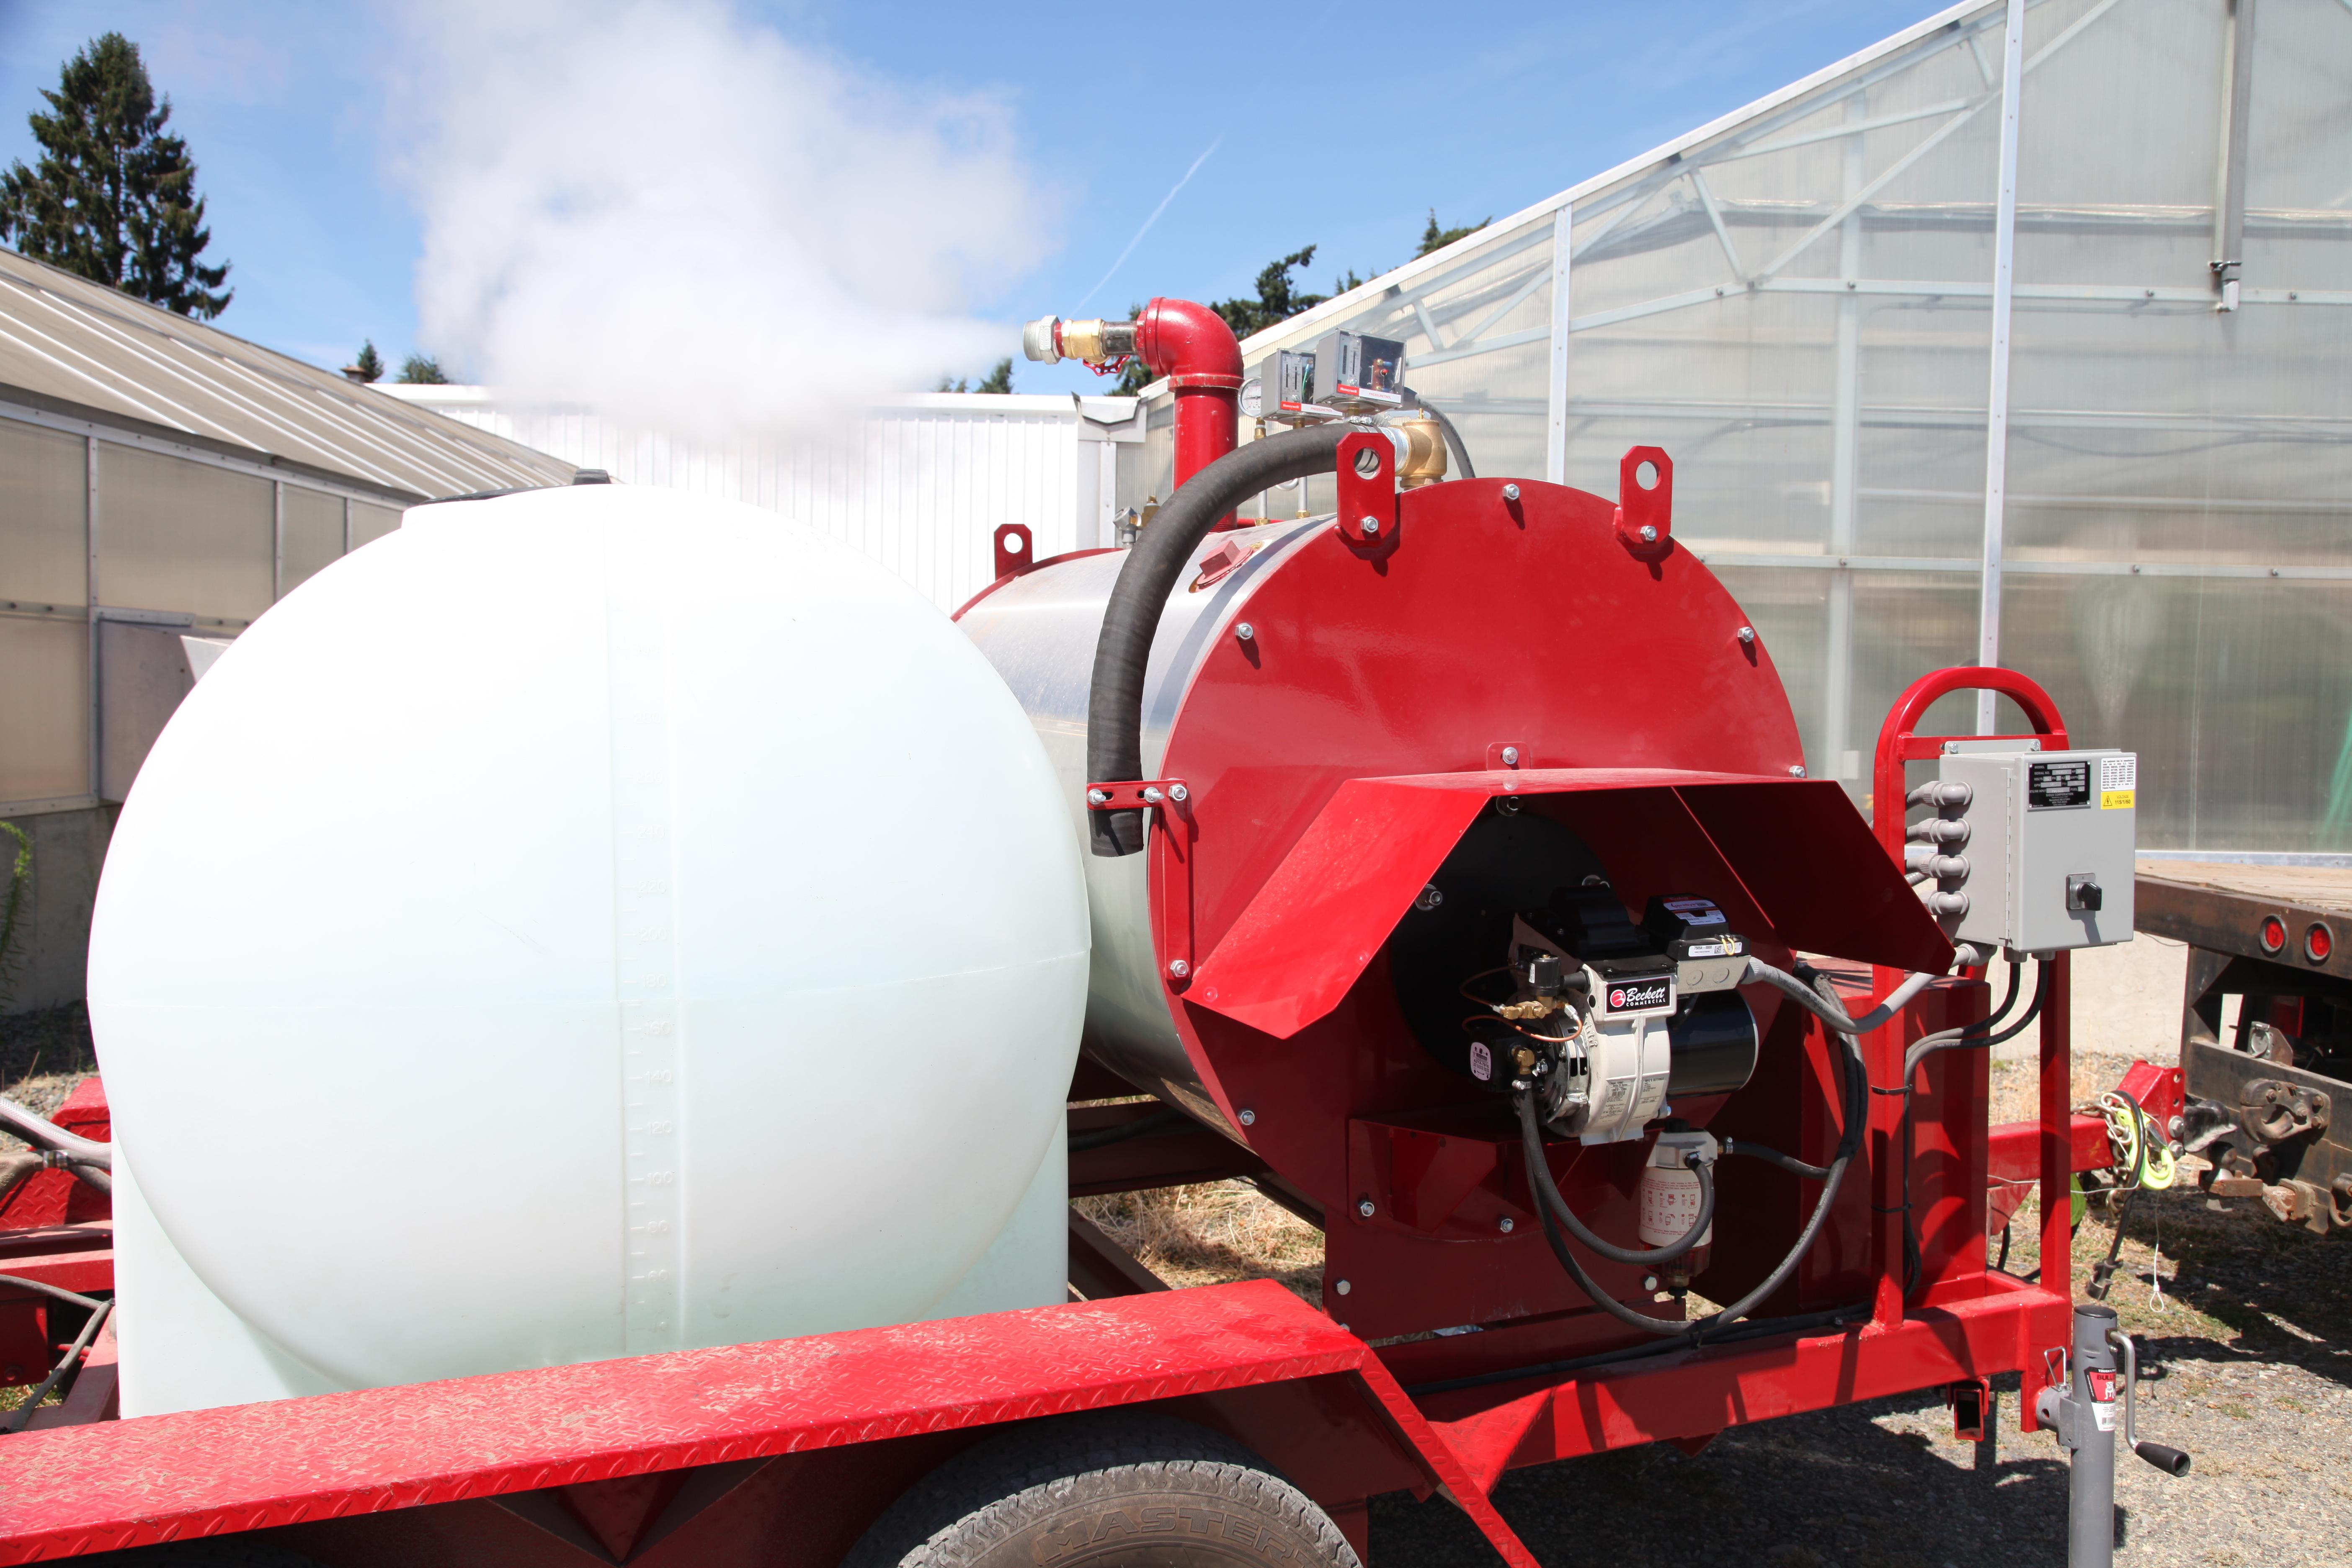 Steam generators | Sudden Oak Death | Washington State University